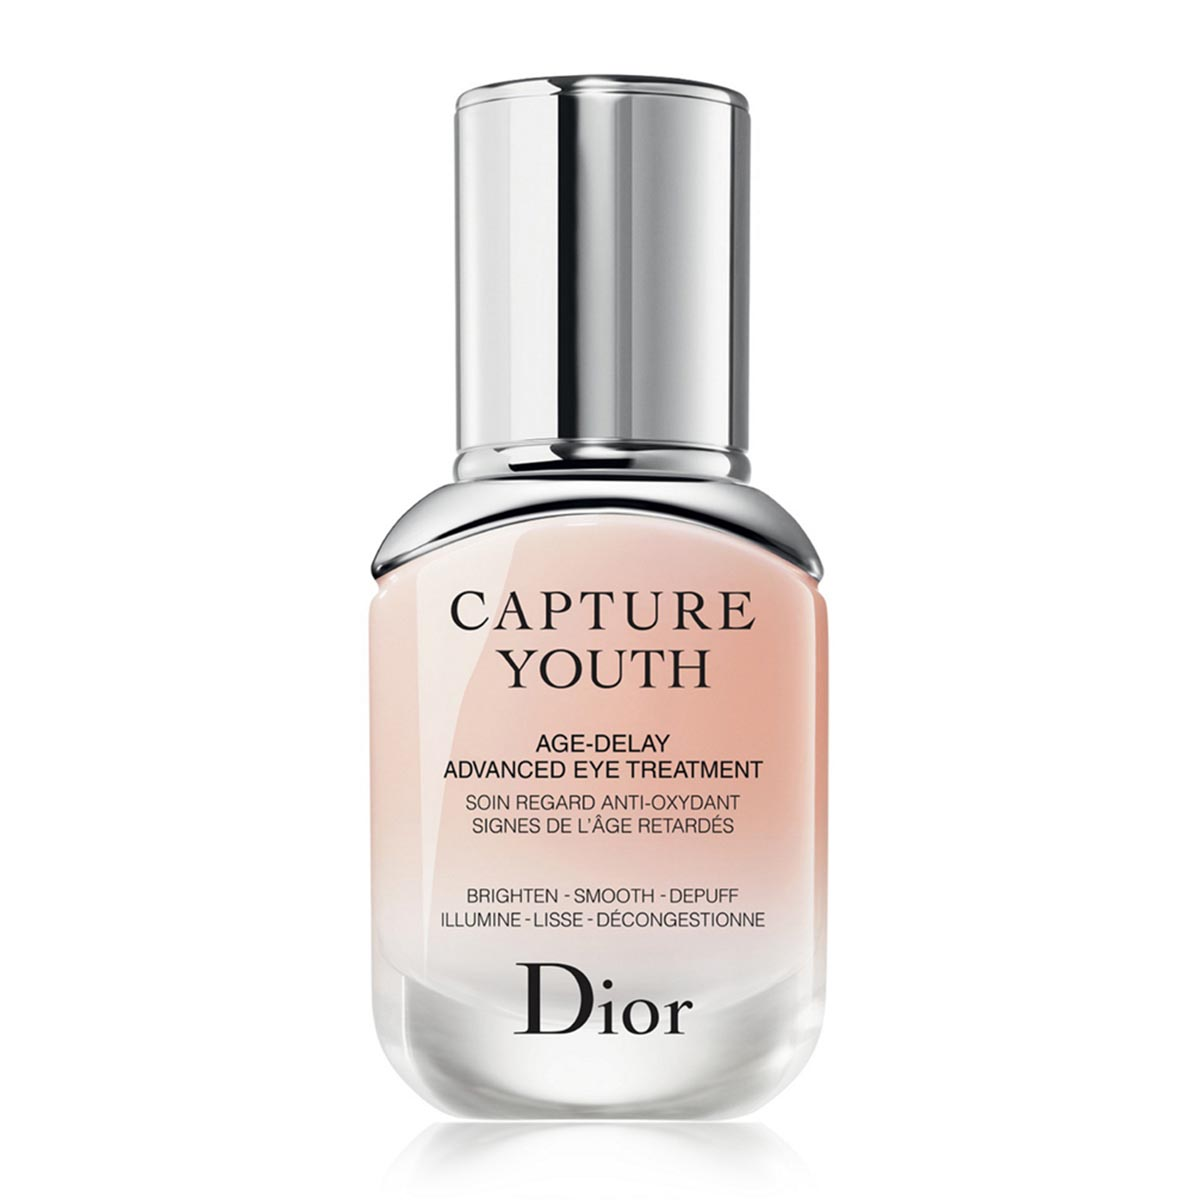 Dior capture youth age delay advanced eye treatment 15ml